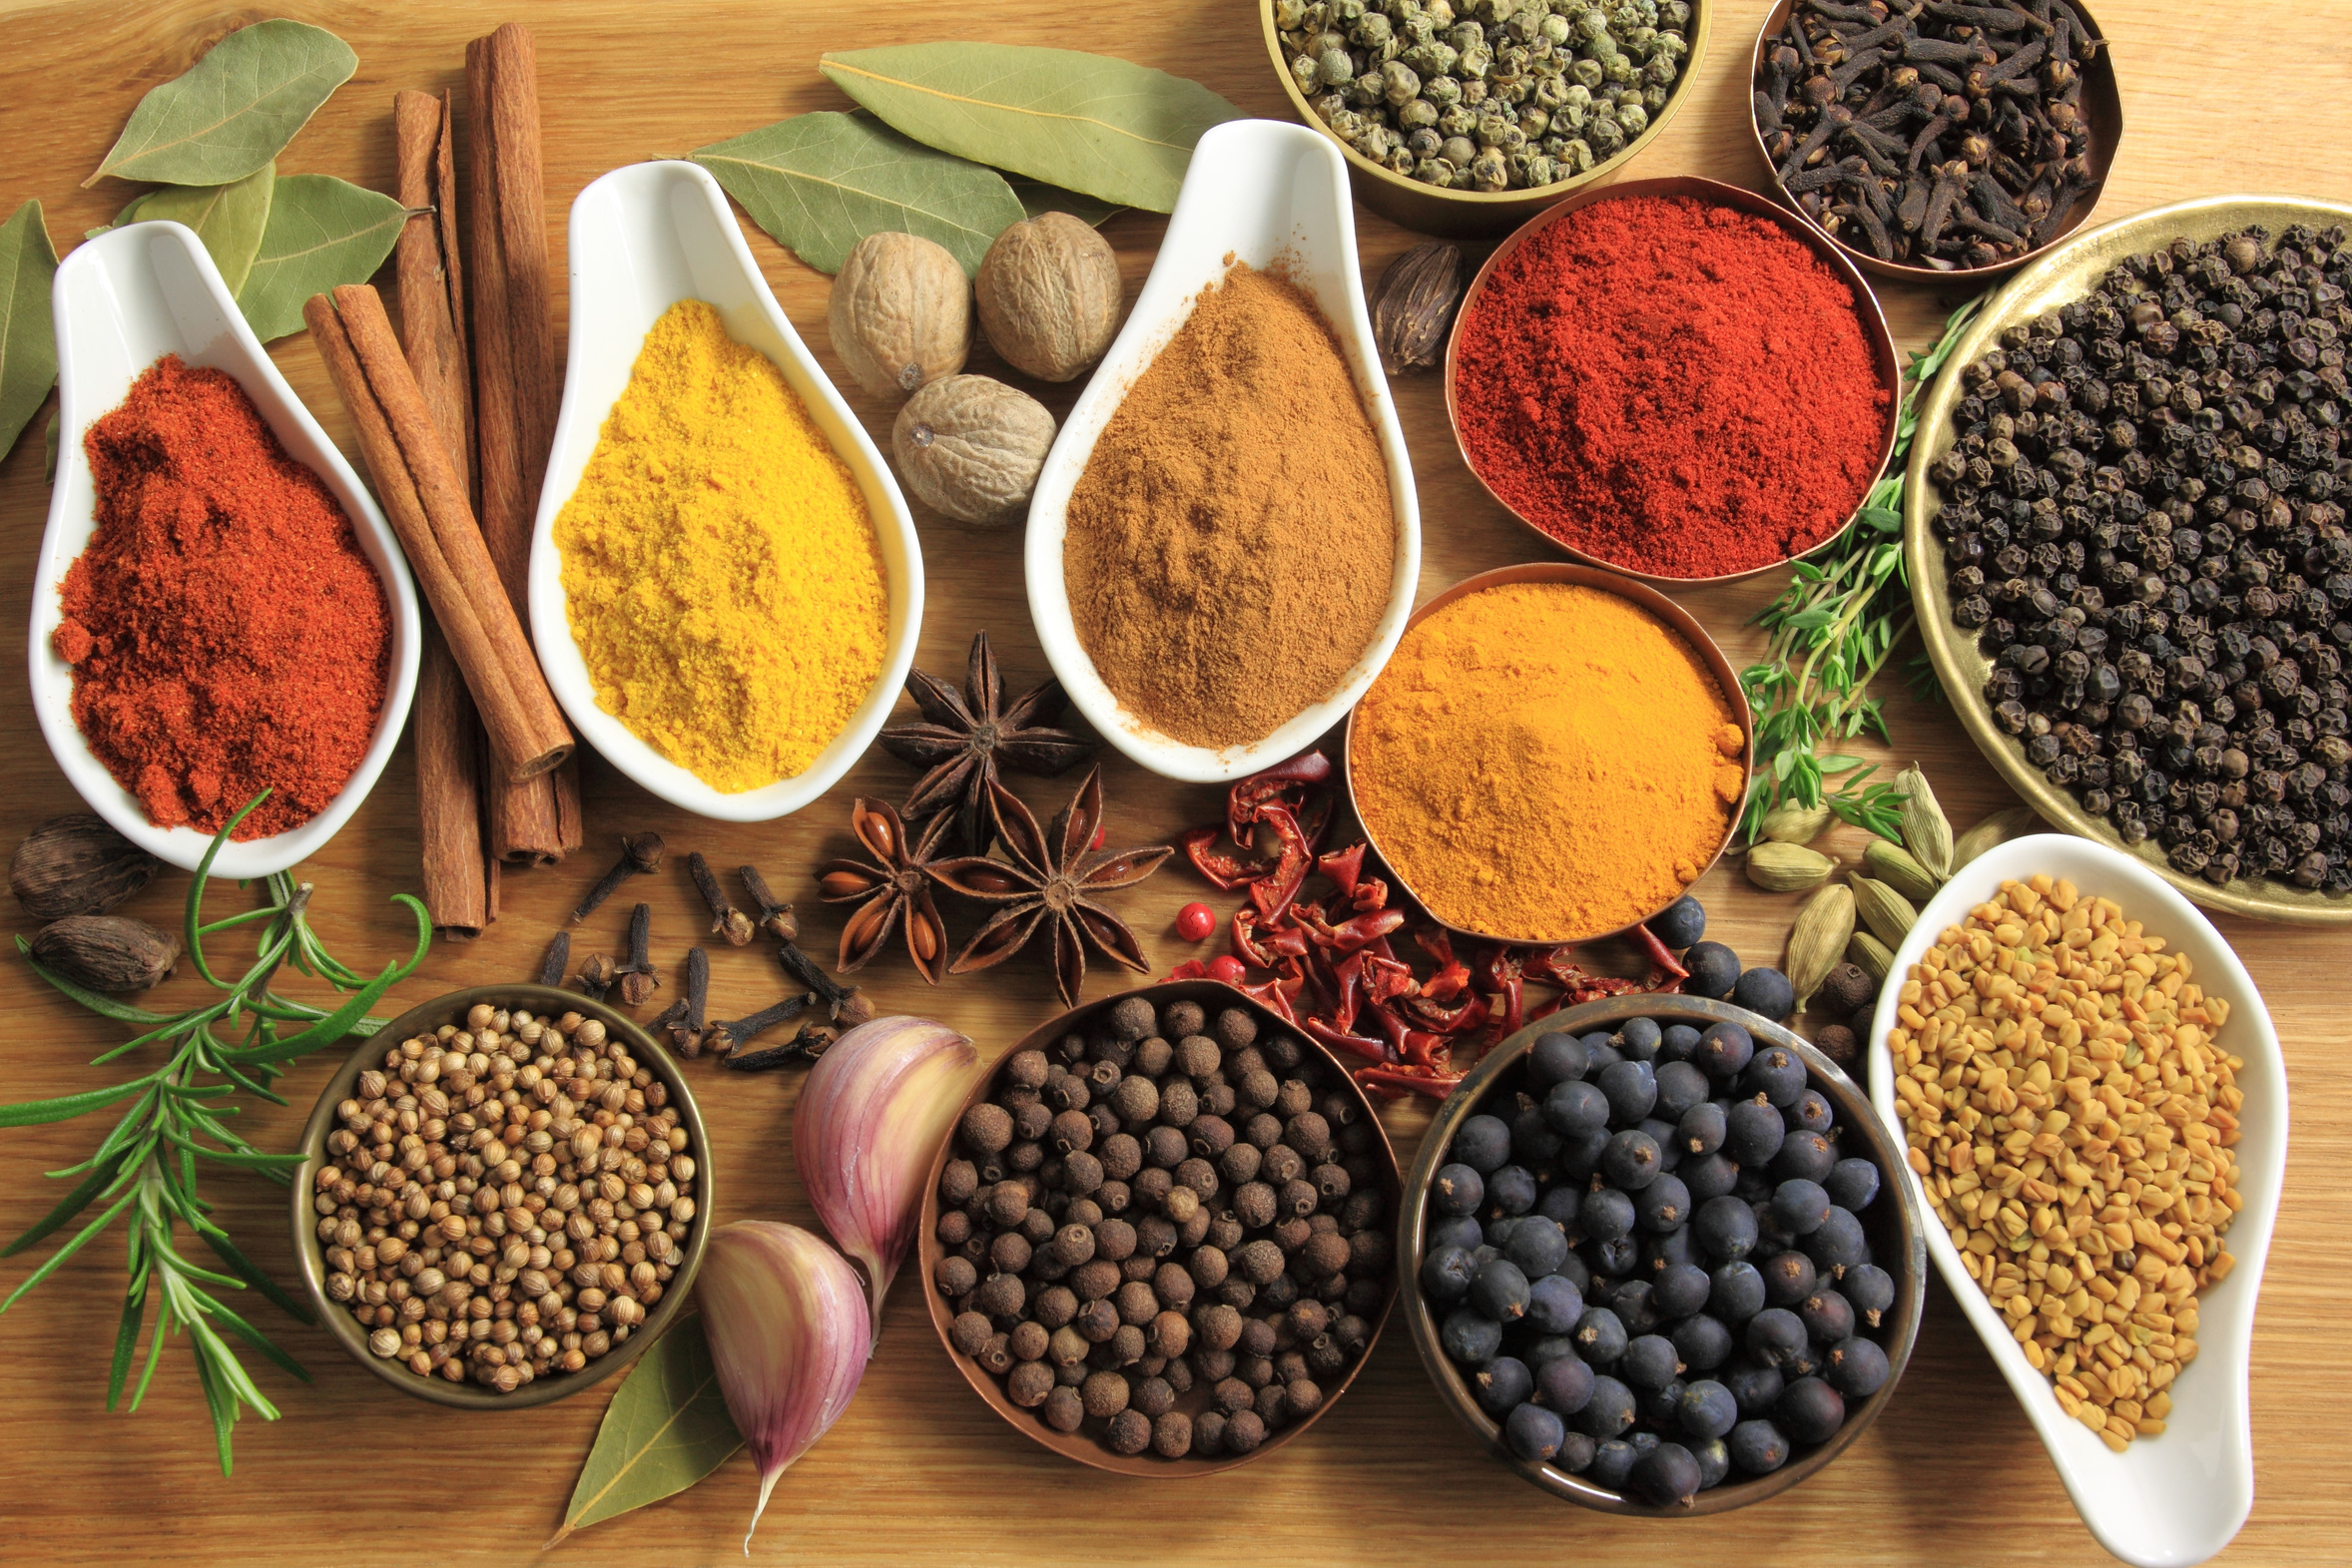 ayurveda-spices.jpg